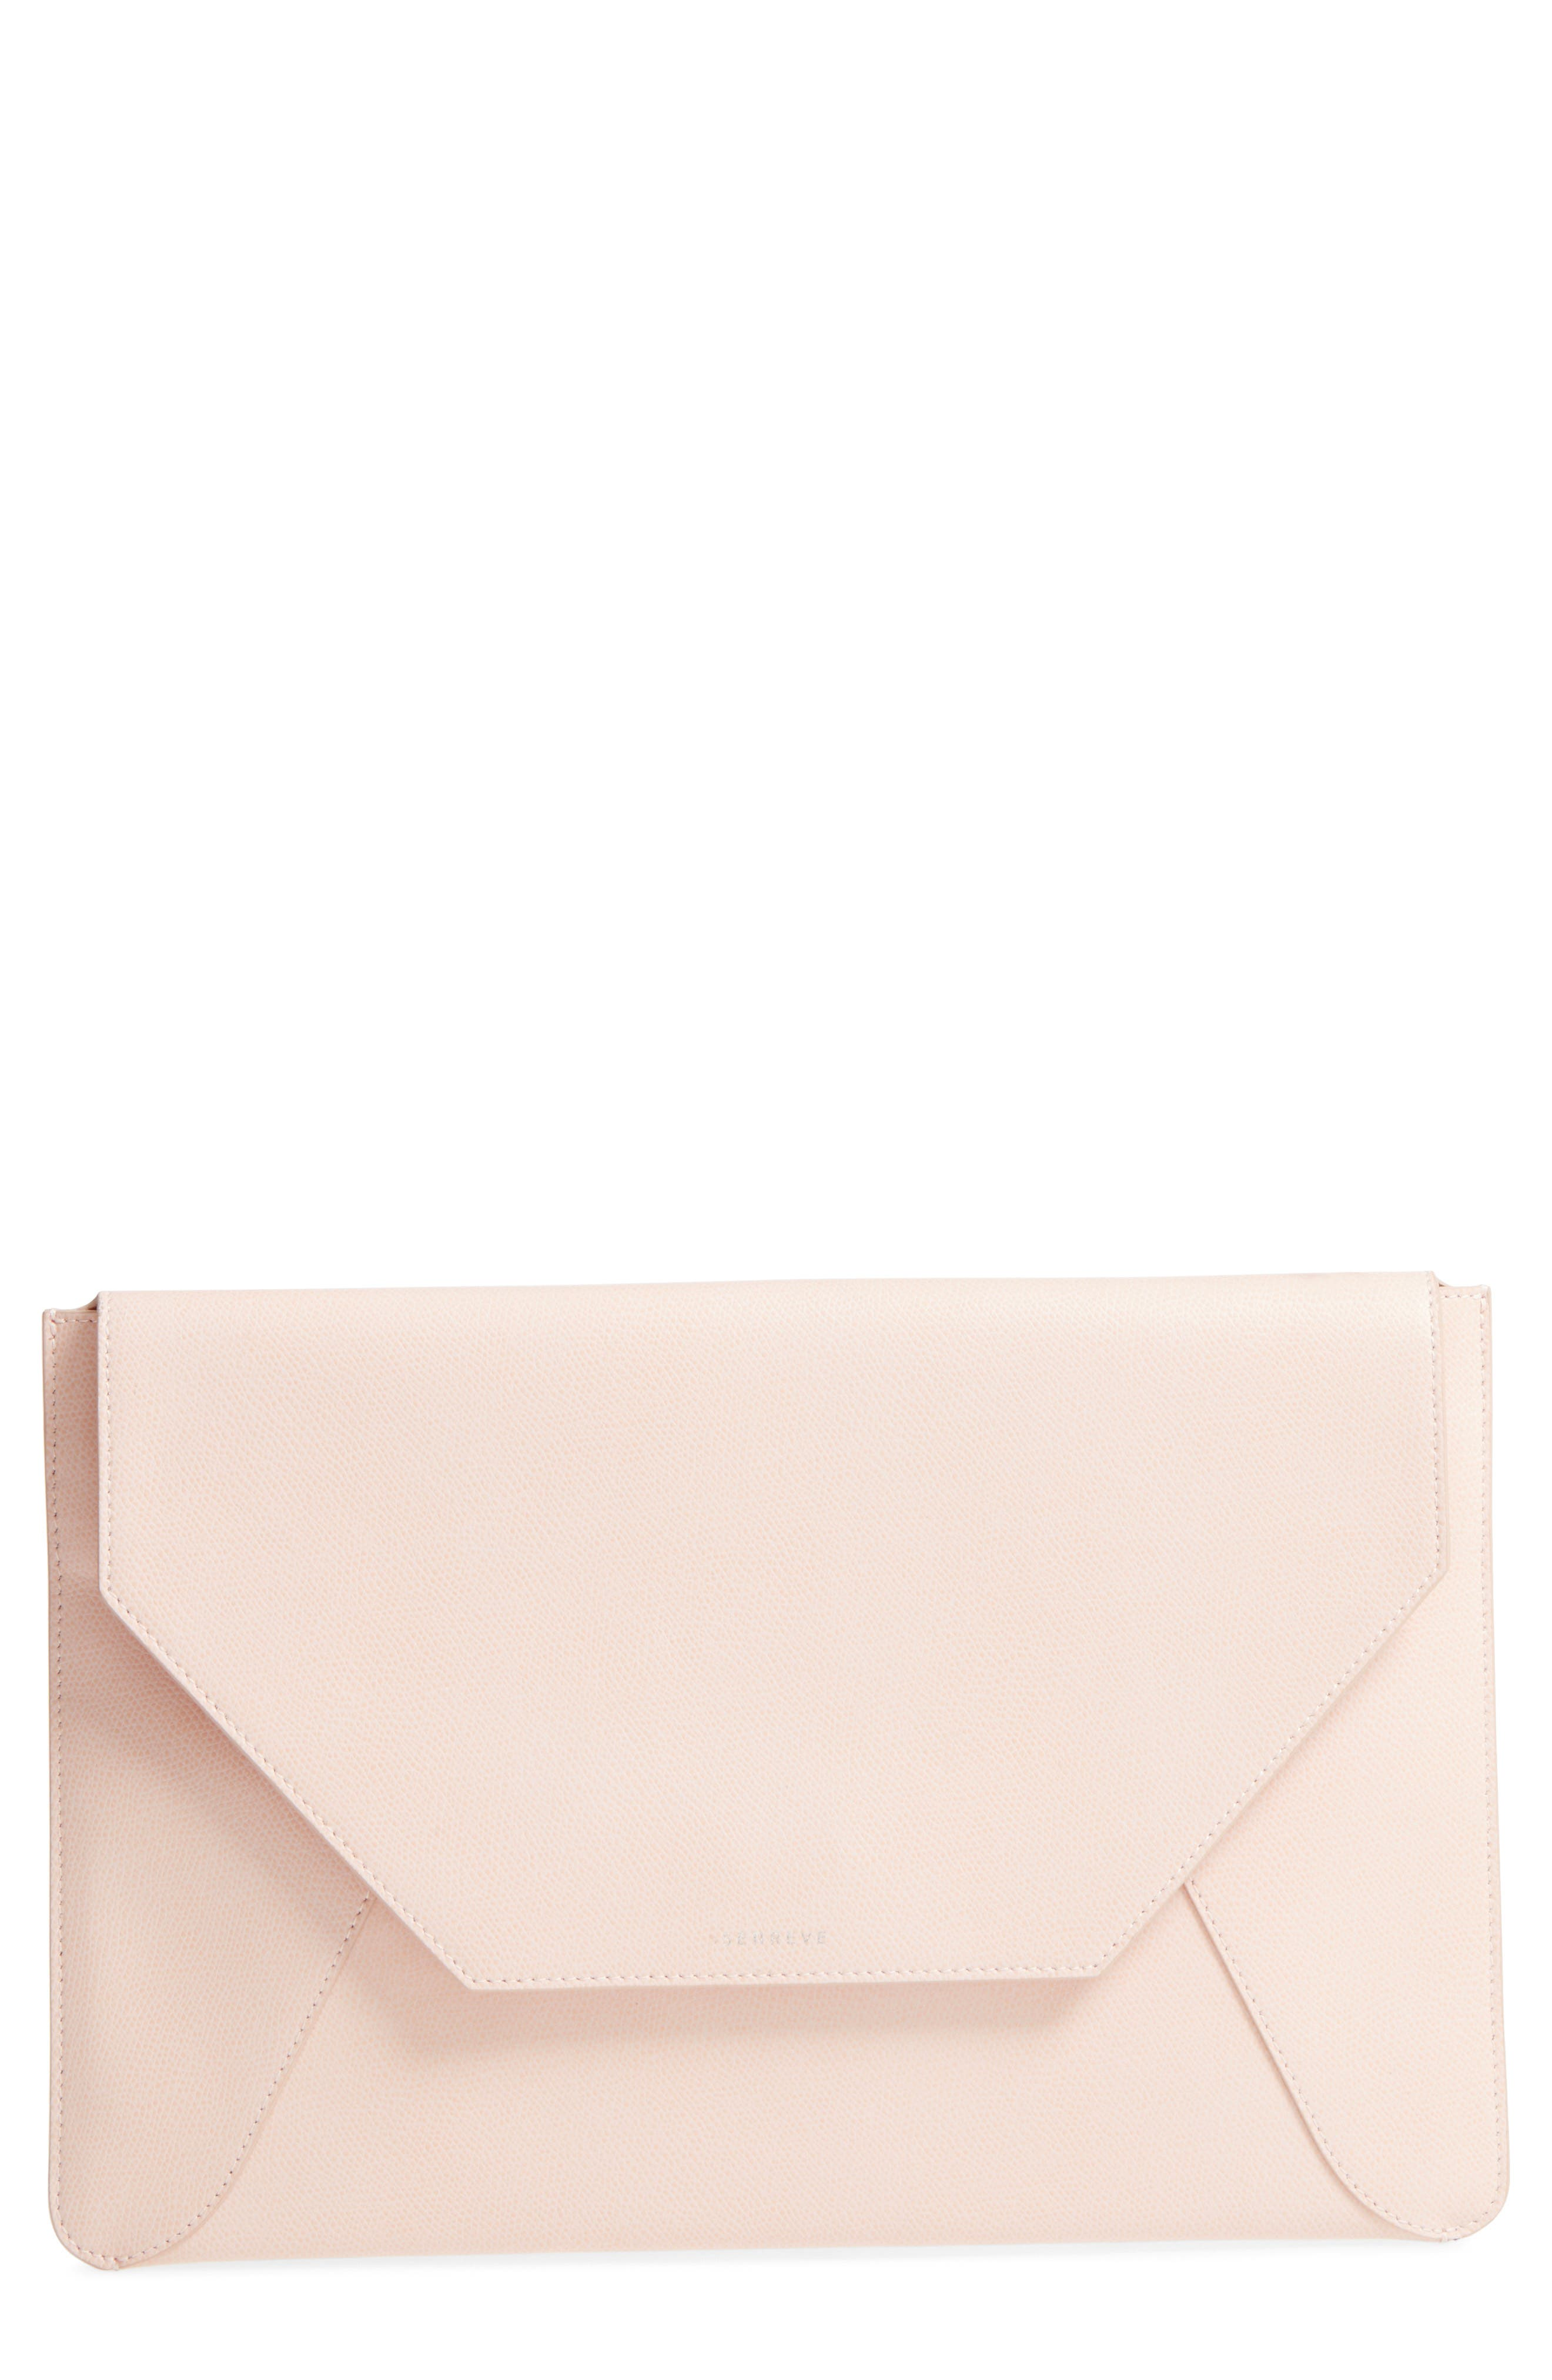 Pebbled Leather Envelope Clutch,                         Main,                         color, Blush